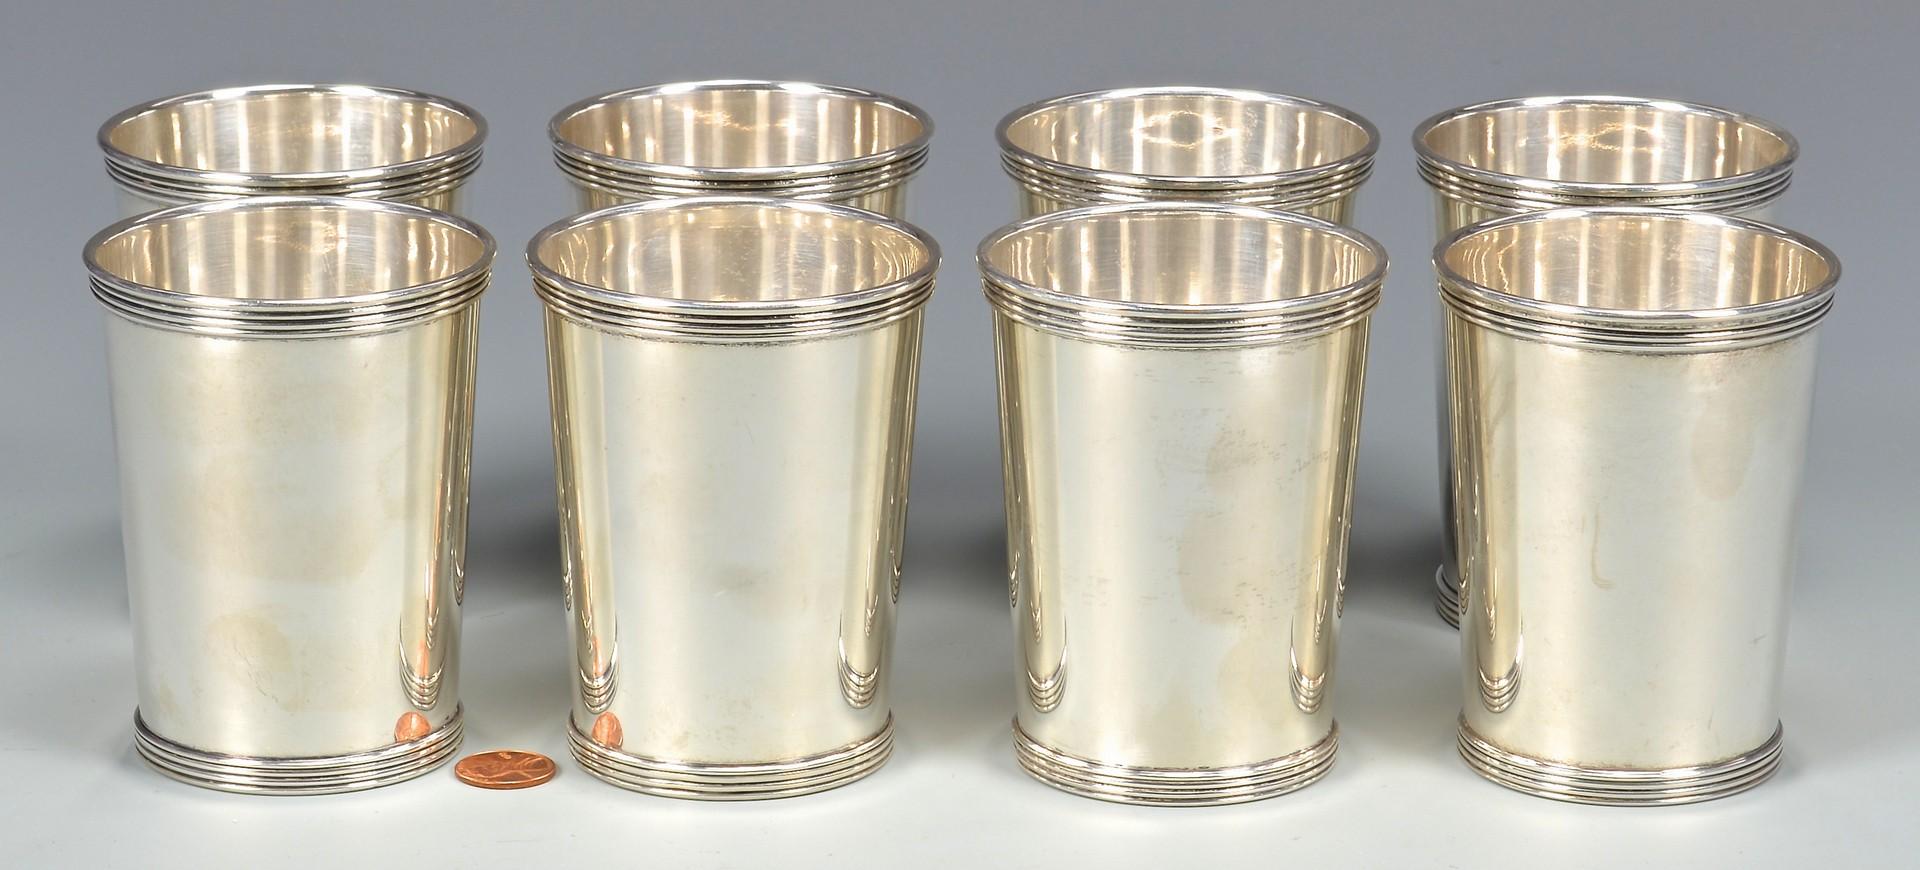 Lot 349: 8 International Sterling Julep Cups